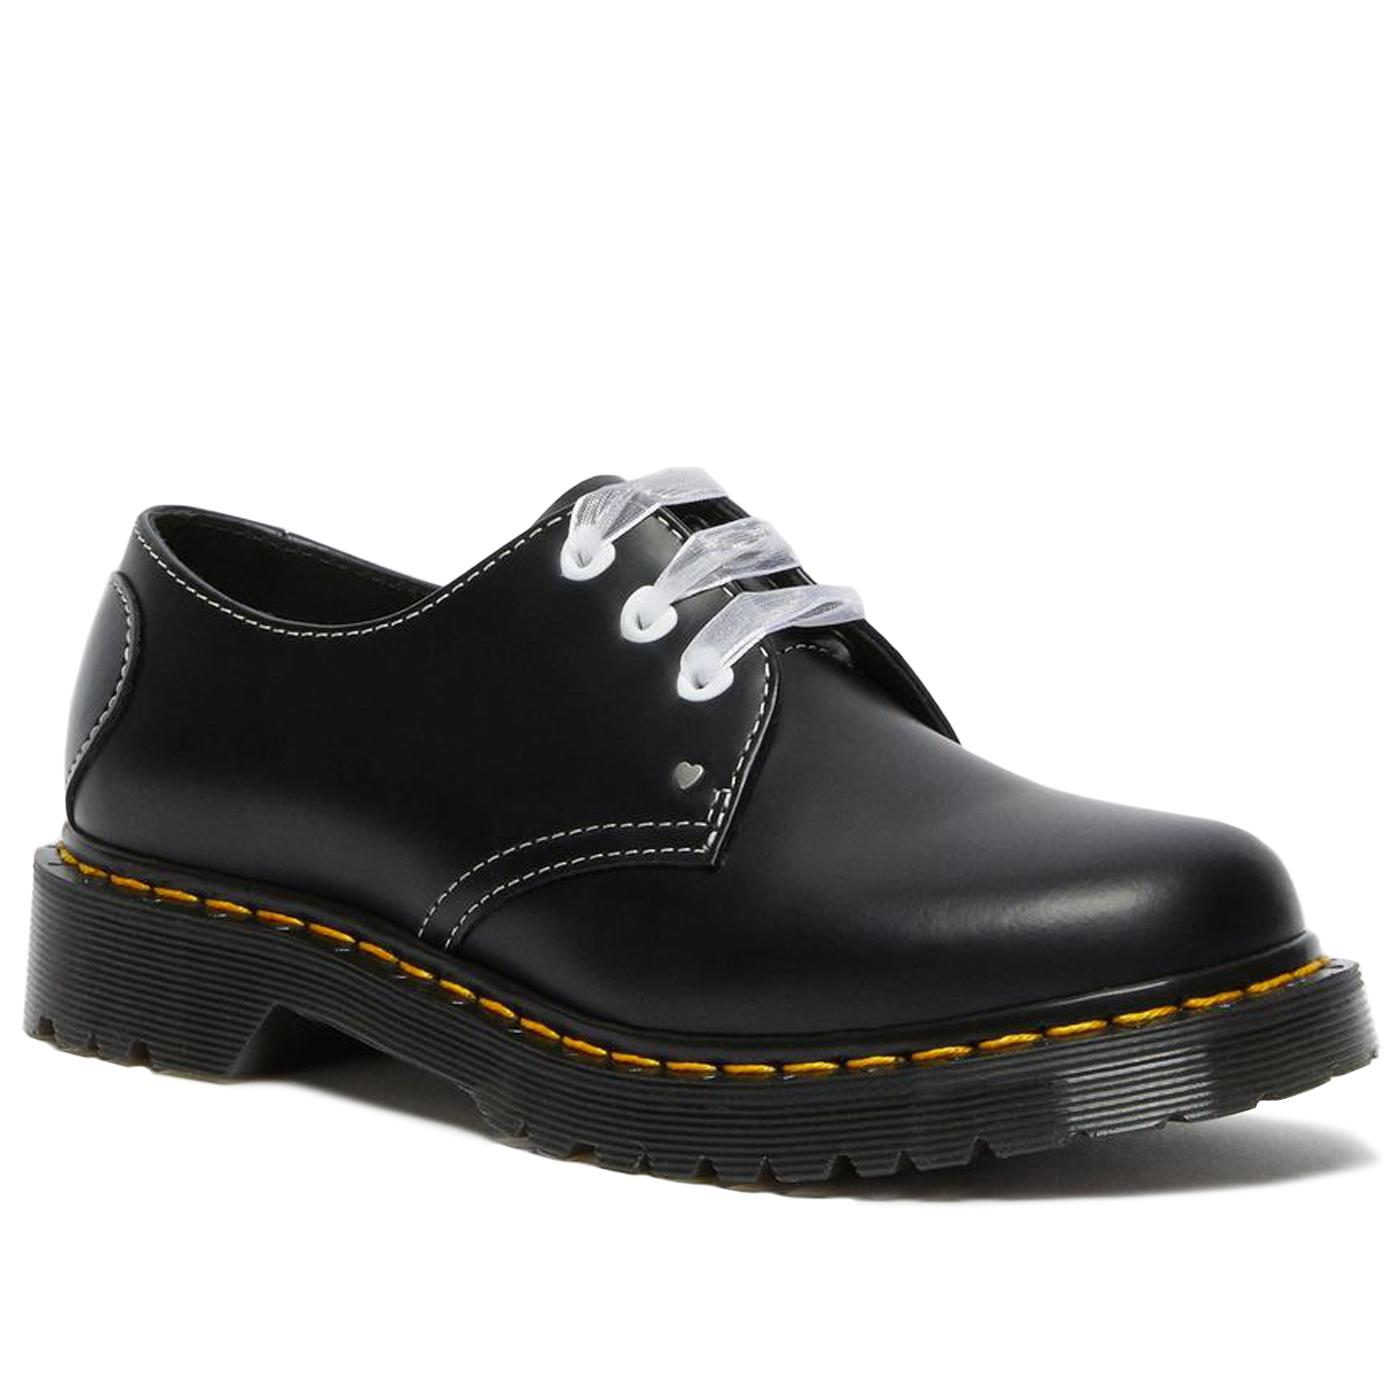 DR MARTENS 1461 Hearts Retro 70s Oxford Shoes (B)